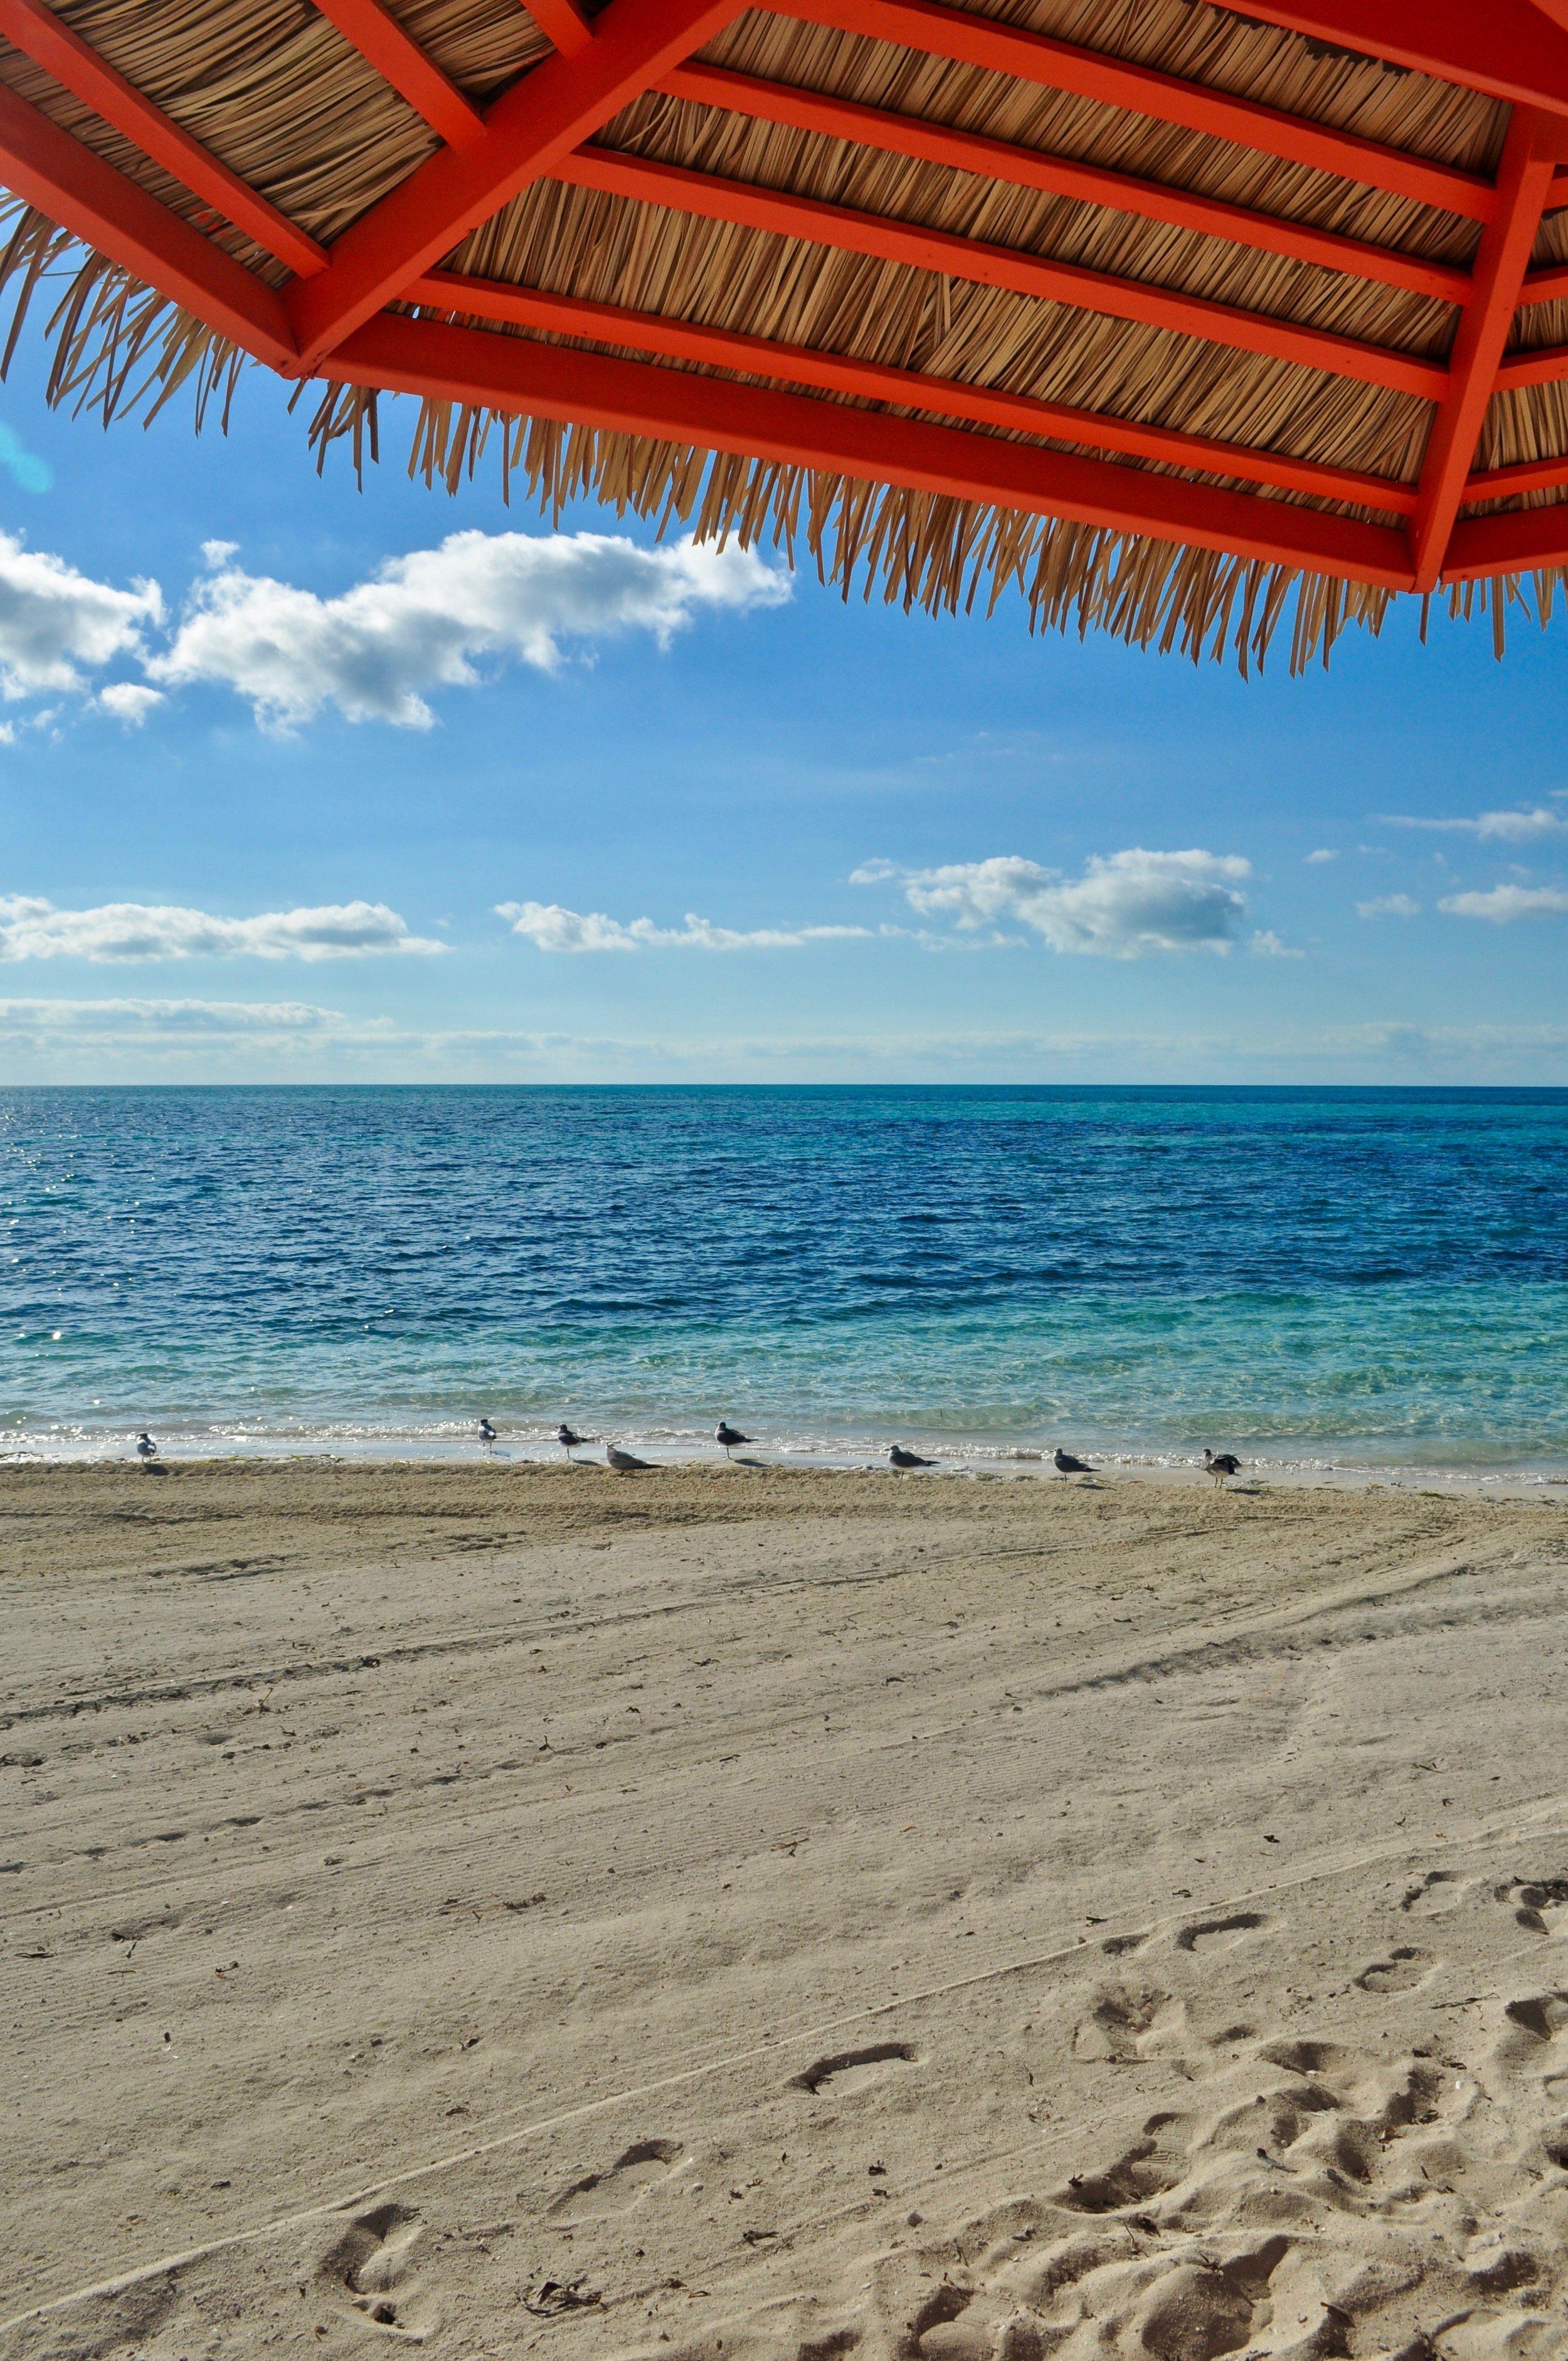 4-Night Bahamas Cruise on Enchantment of the Seas - A Happy Passport #cruise #nassau #bahamas